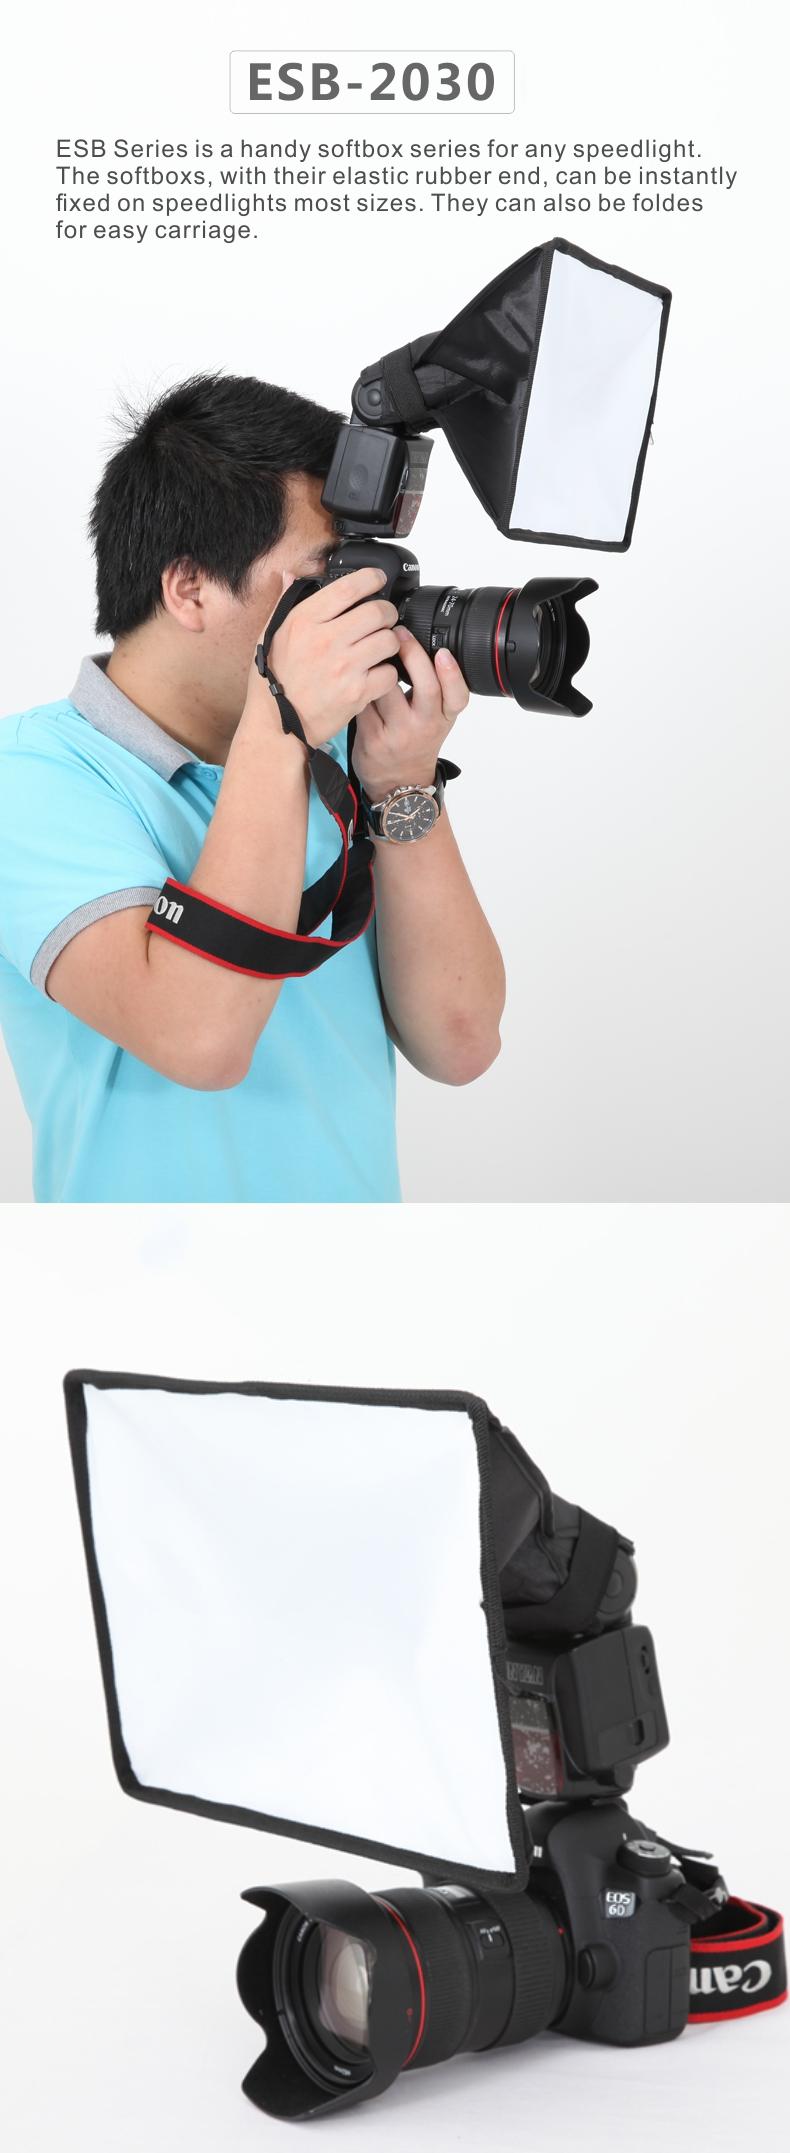 Falconeyes ESB2030 Portable Foldable Flash Diffuser Softbox for Canon Nikon Sony DSLR flash Speedlite Photo Studio Accessories 8